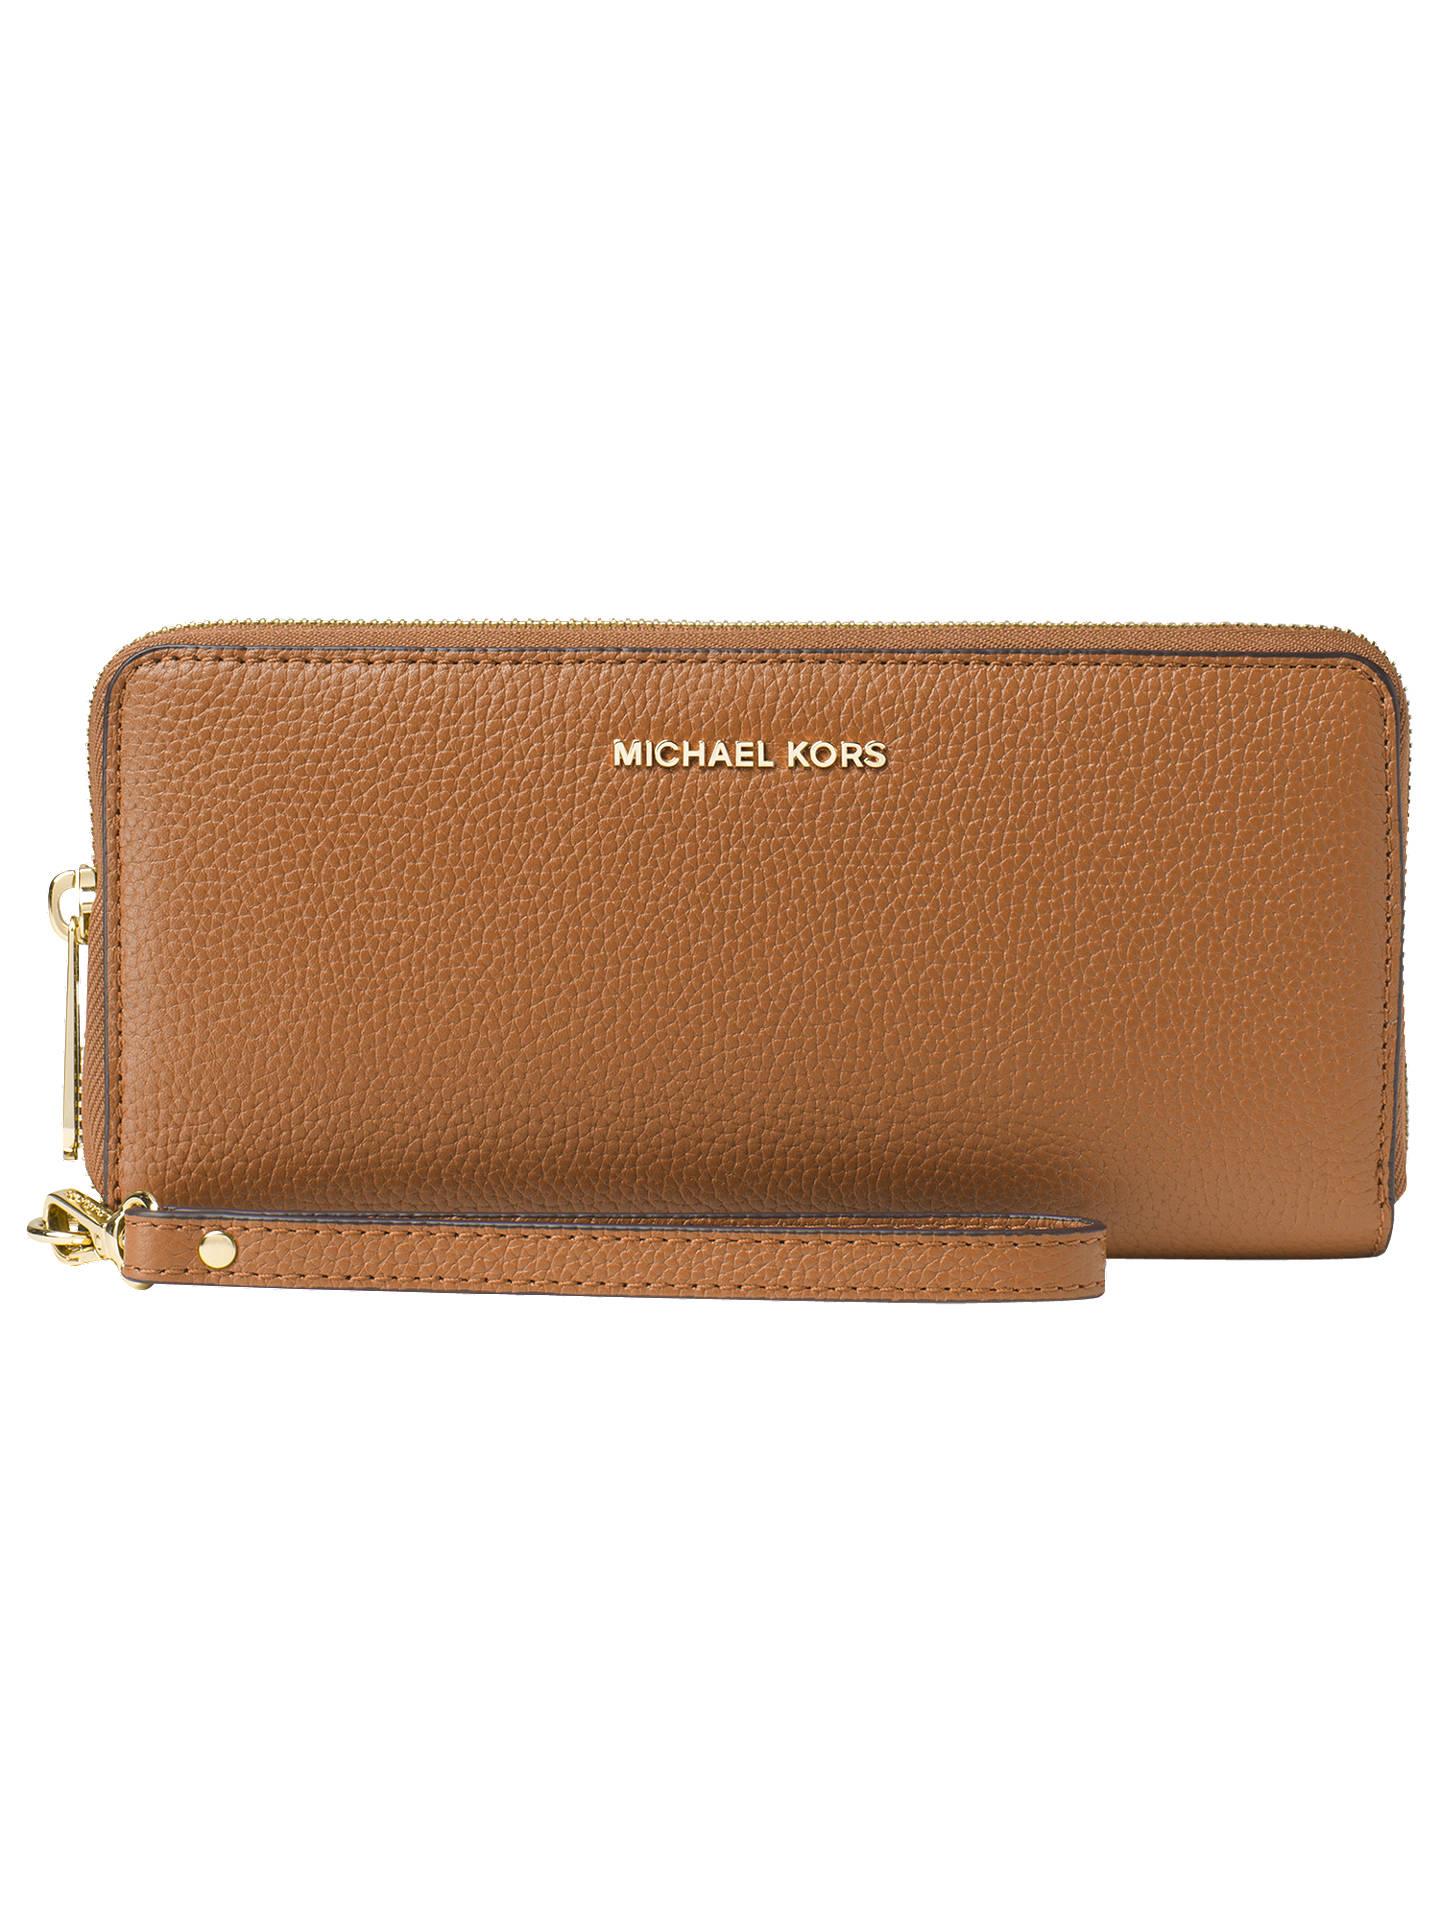 9cdcfc85c2d5 MICHAEL Michael Kors Money Pieces Leather Continental Purse at John ...